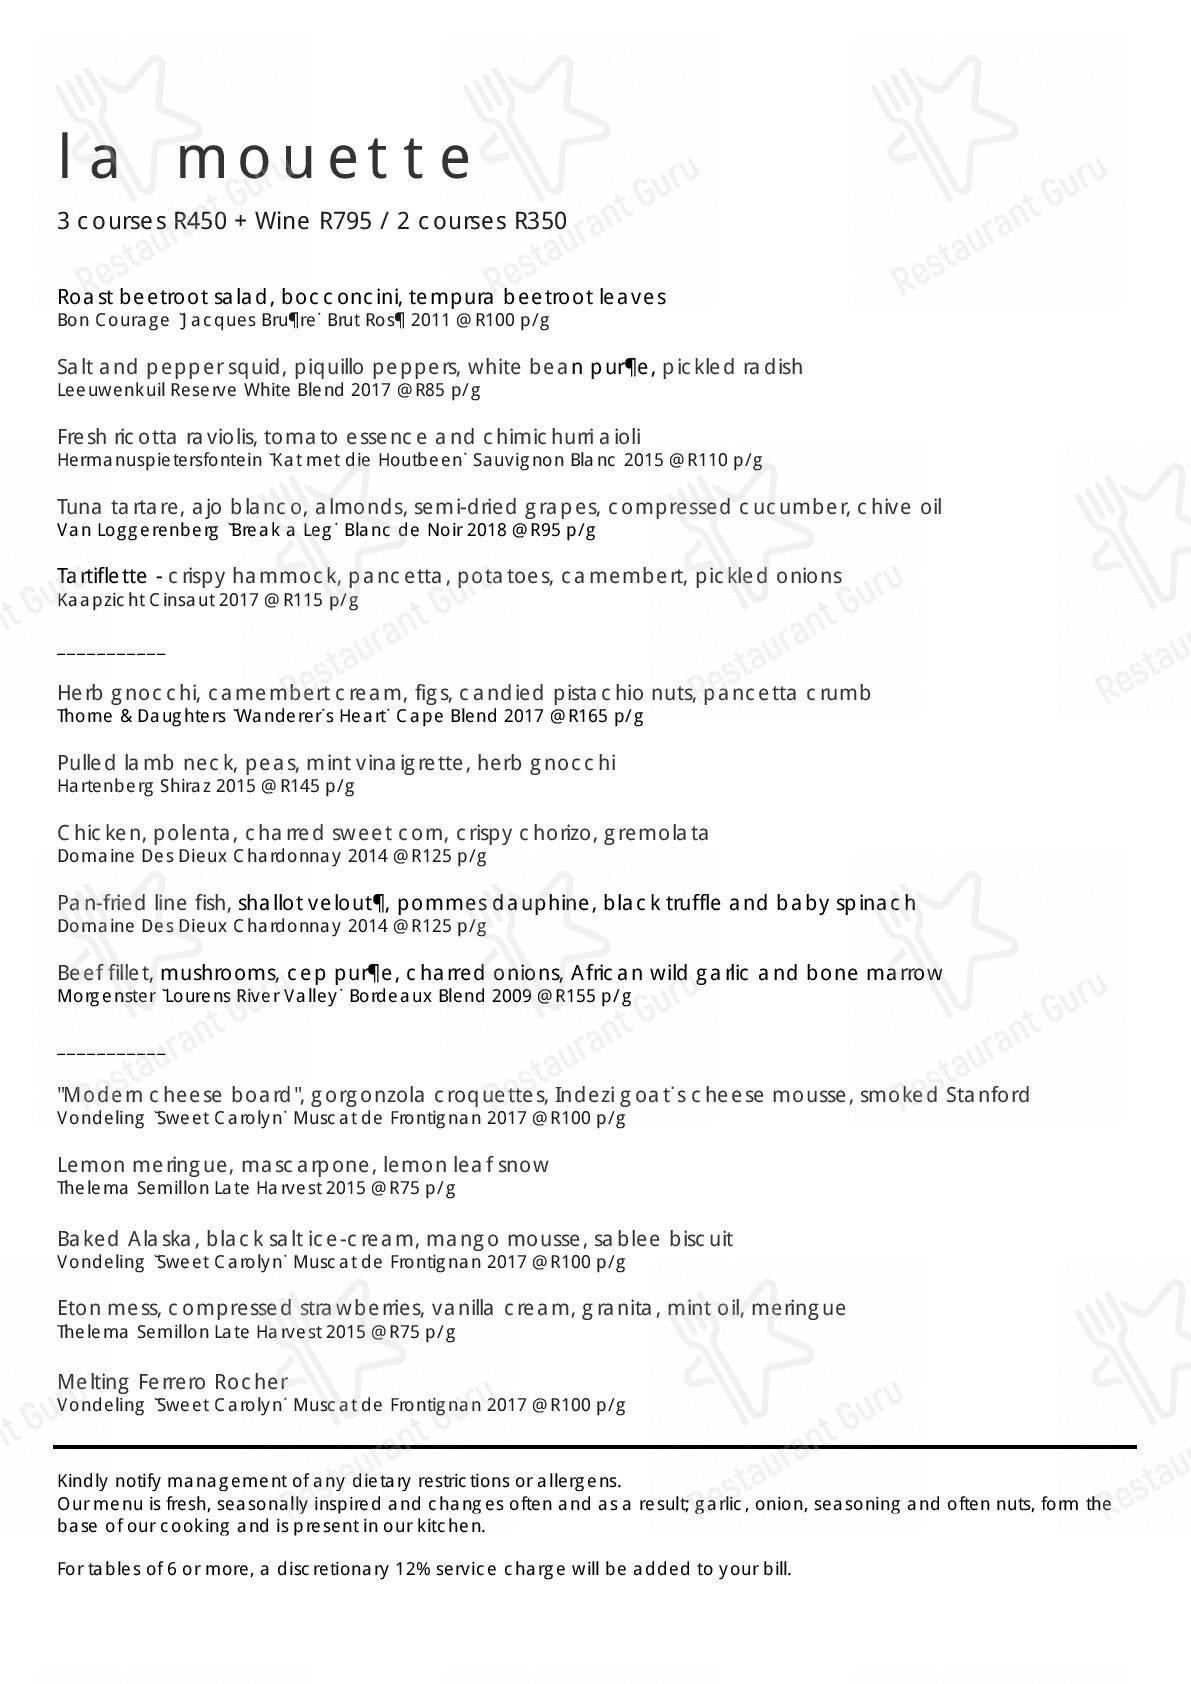 La Mouette menu - meals and drinks